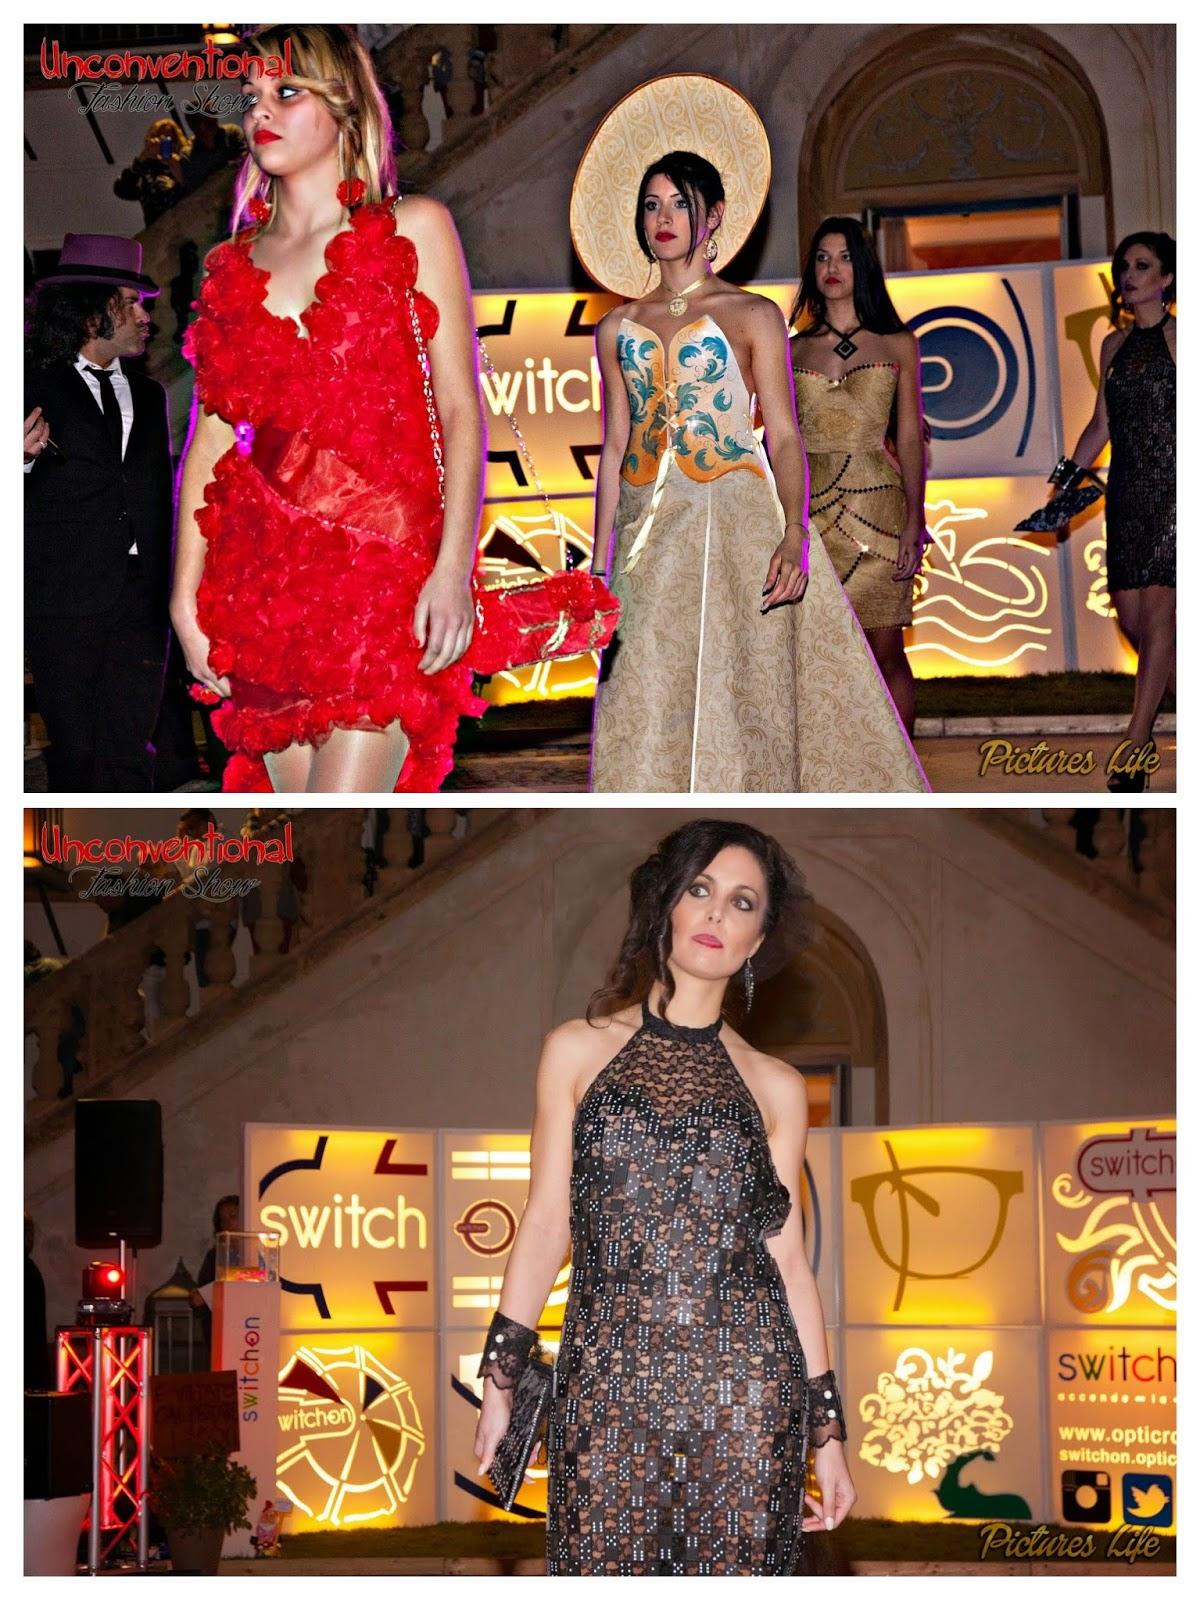 simone_perricone, sps, stilista, fashion_designer, dress_recycling